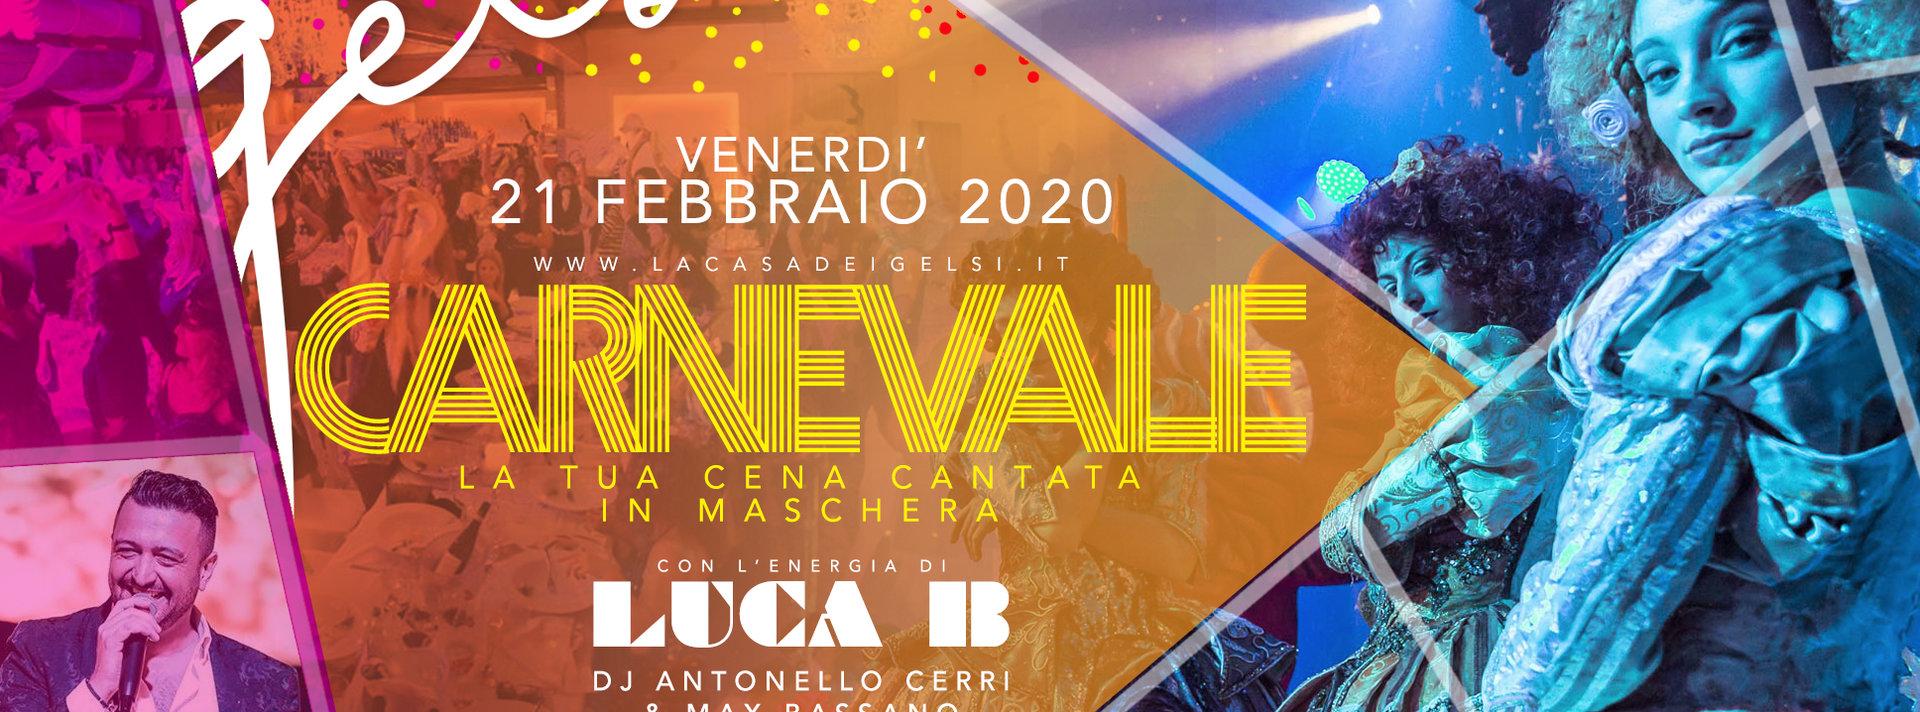 Carnevale 2020 alla Casa dei Gelsi